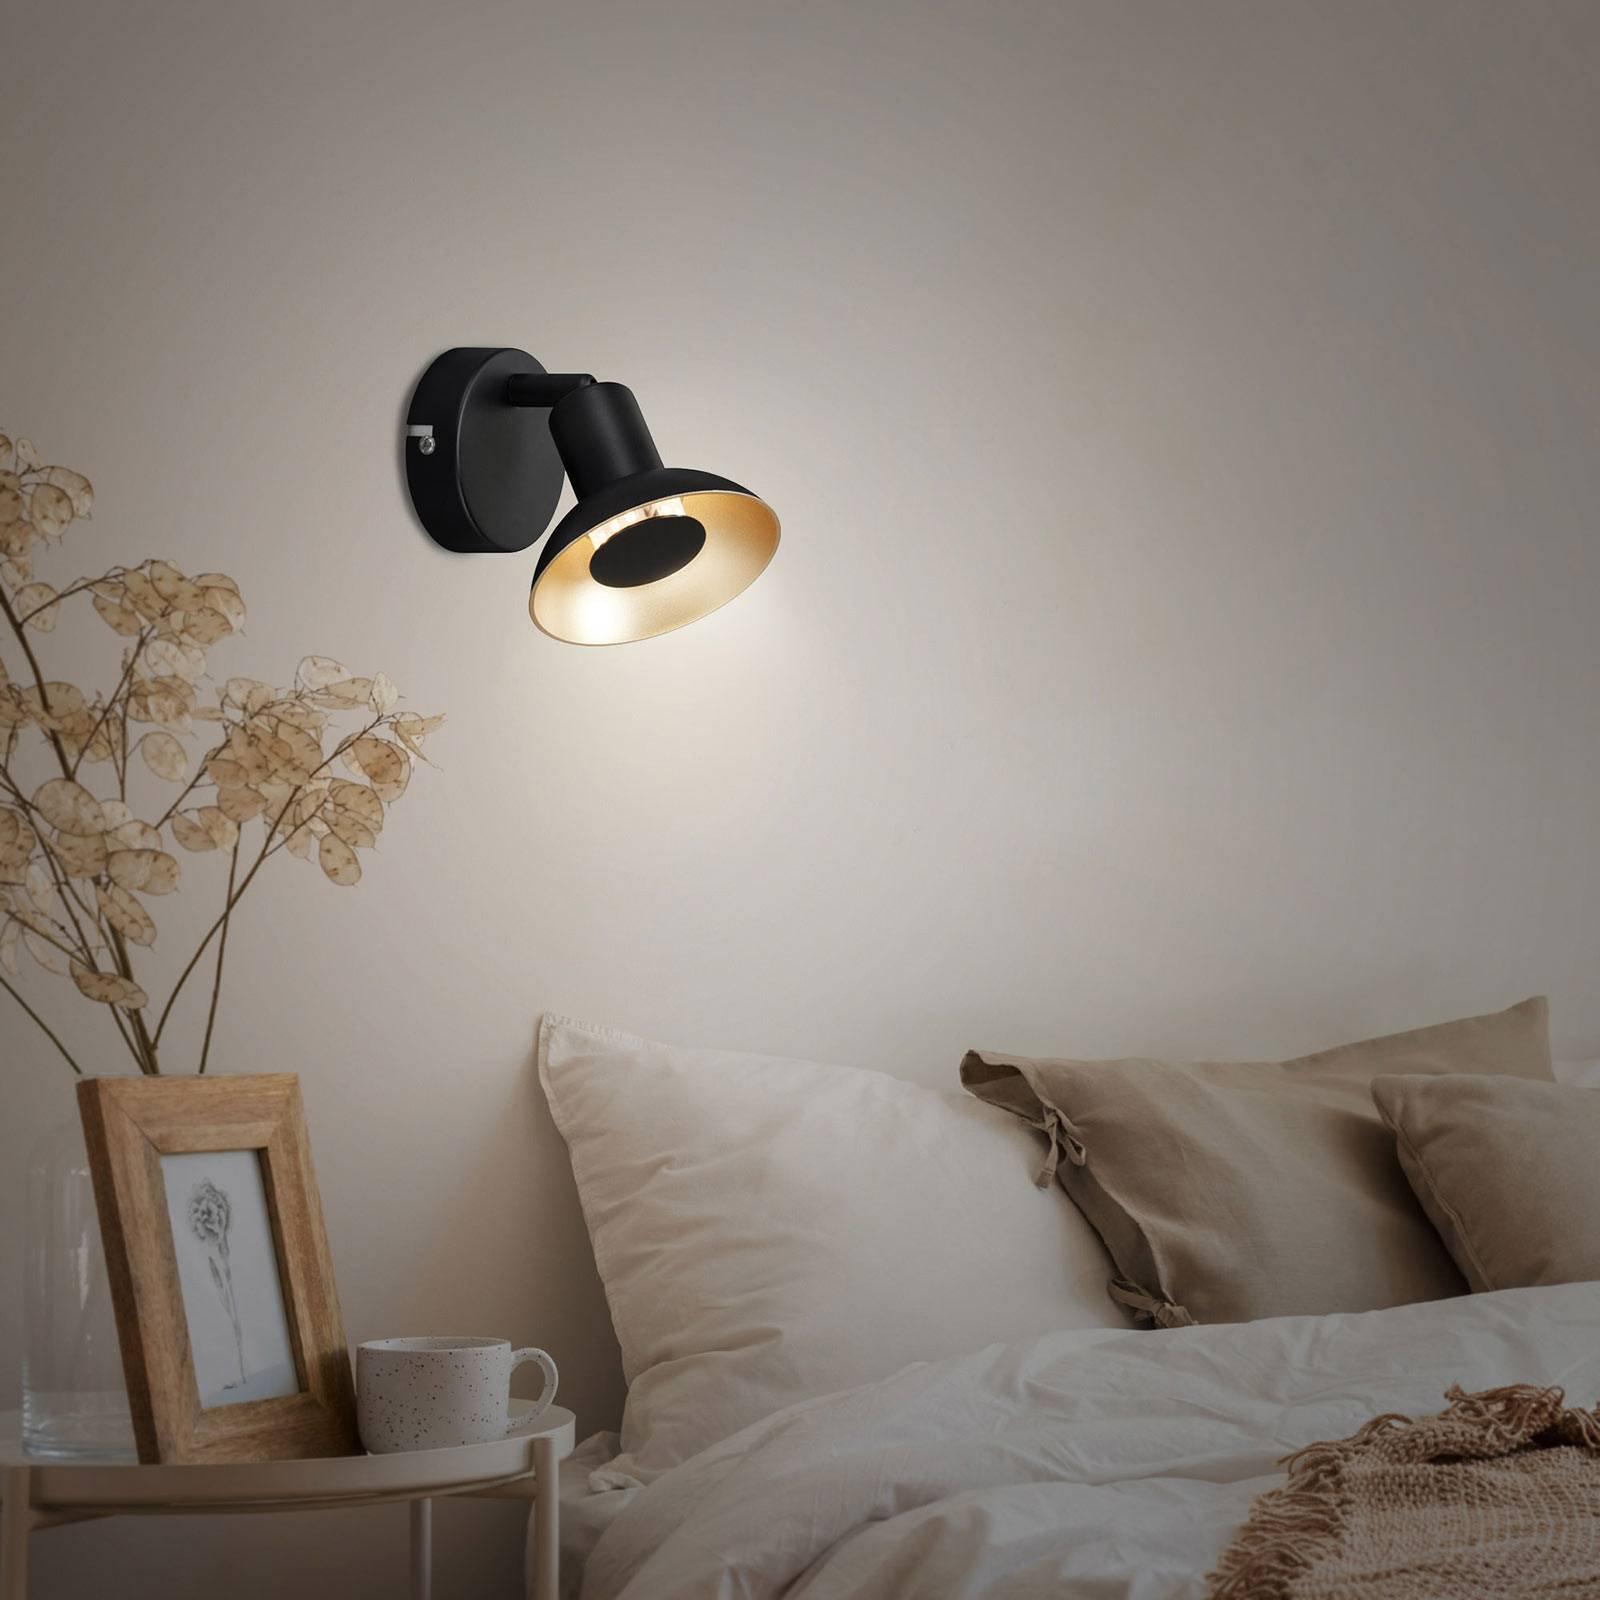 LED-vegglampe Kukui, 1 lyskilde